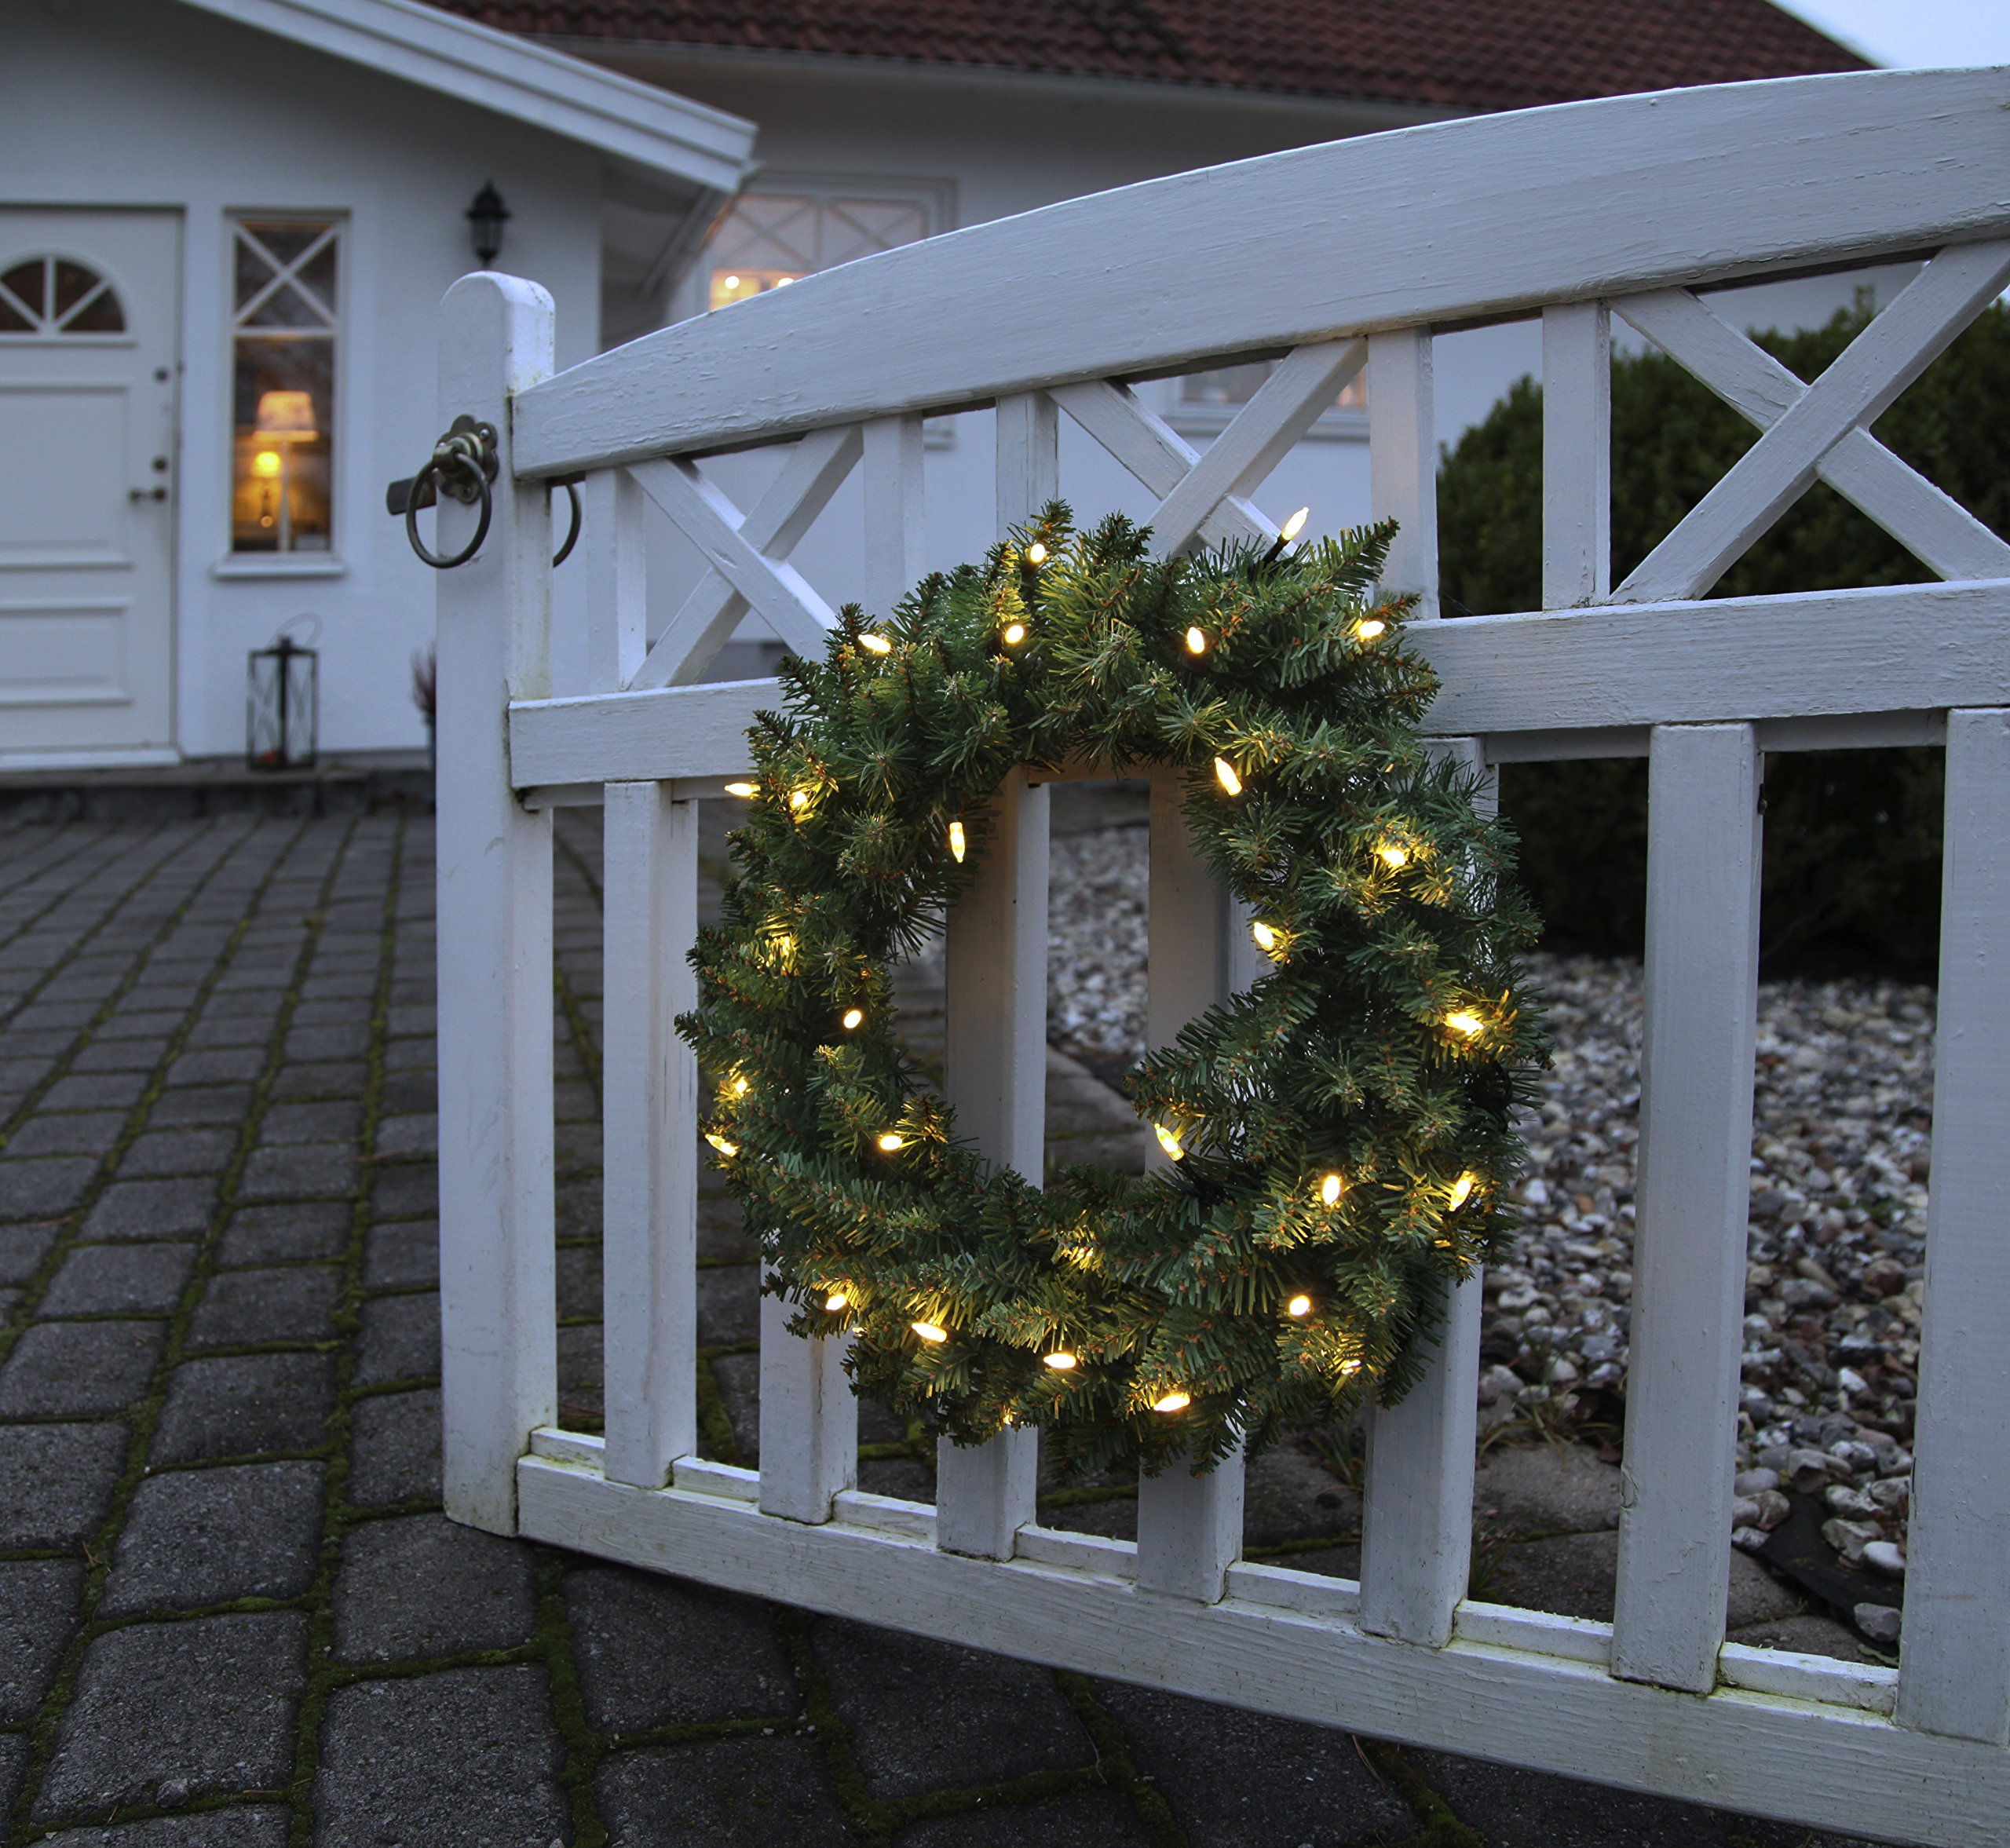 Star-LED-TannenkranzCalgary-beleuchtet-30-warmwei-Pisello-LED-outdoor-Trafo-Karton-Durchmesser-50-cm-612-60